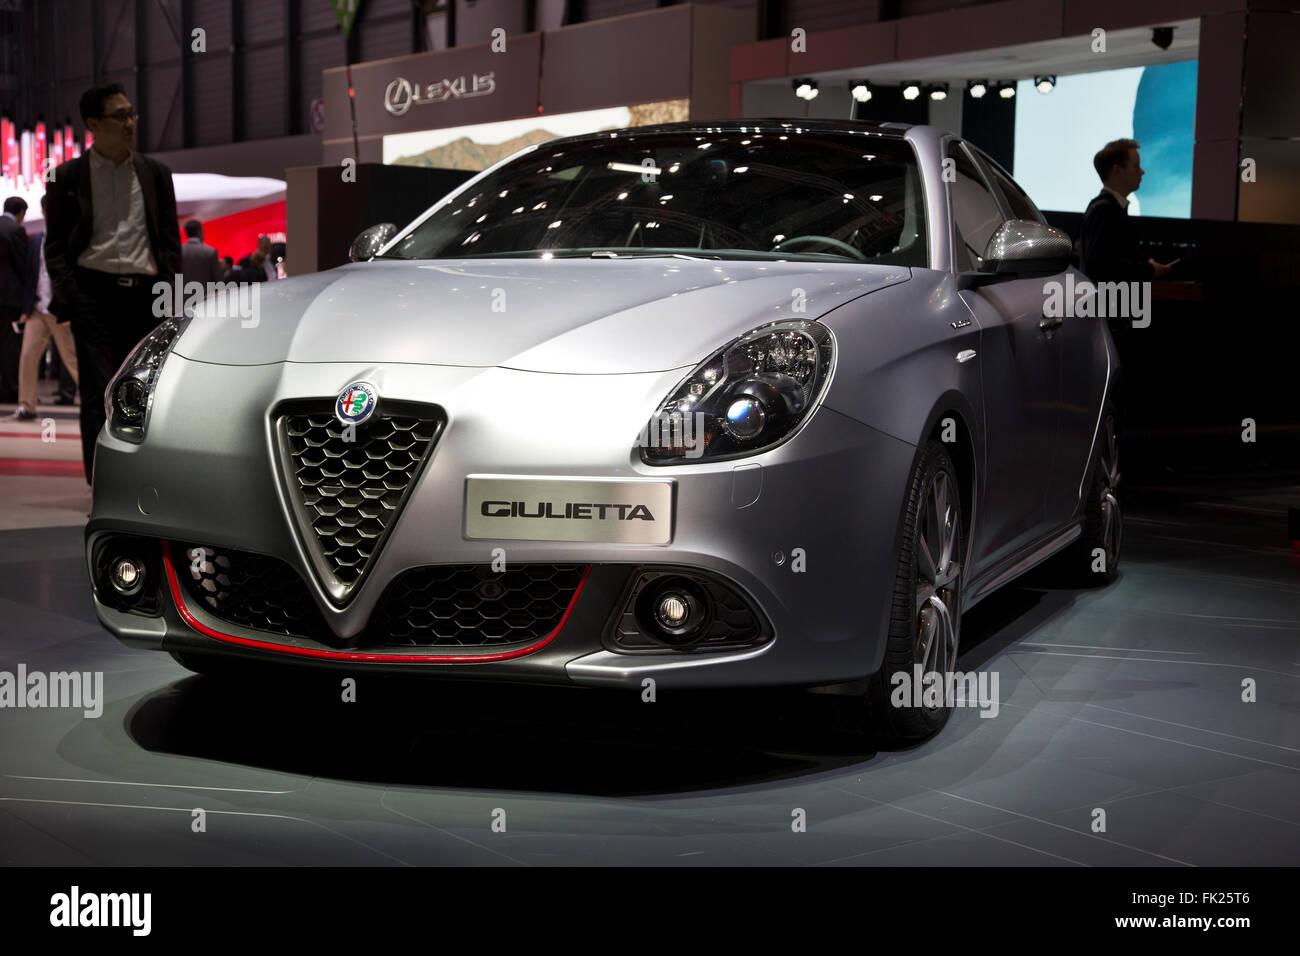 Alfa Romeo Giulietta auf dem Genfer Autosalon 2016 Stockbild